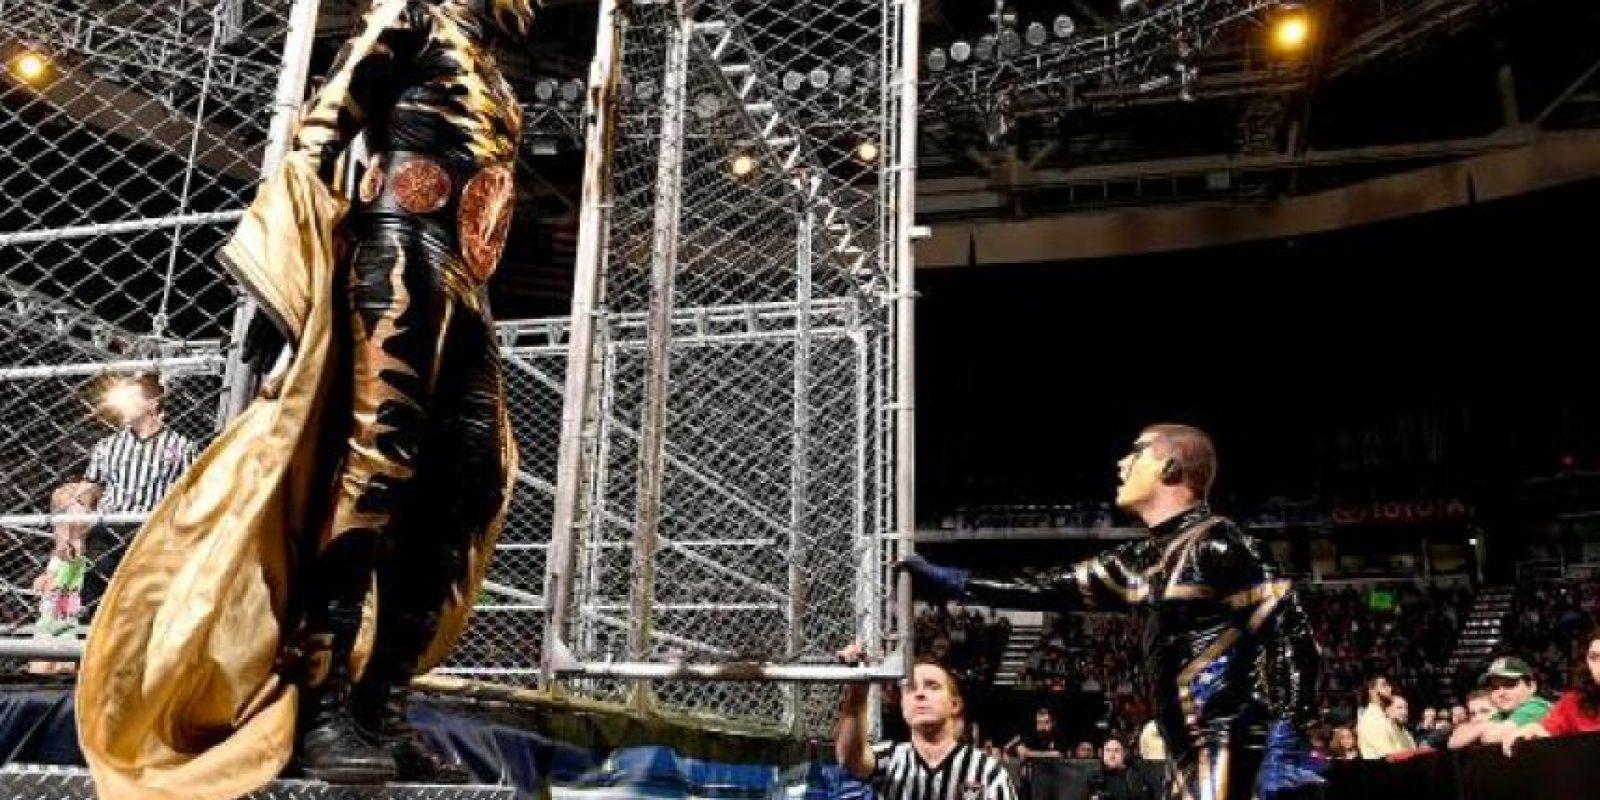 Patrick Dustin Runnels es el nombre real del dorado Foto:WWE